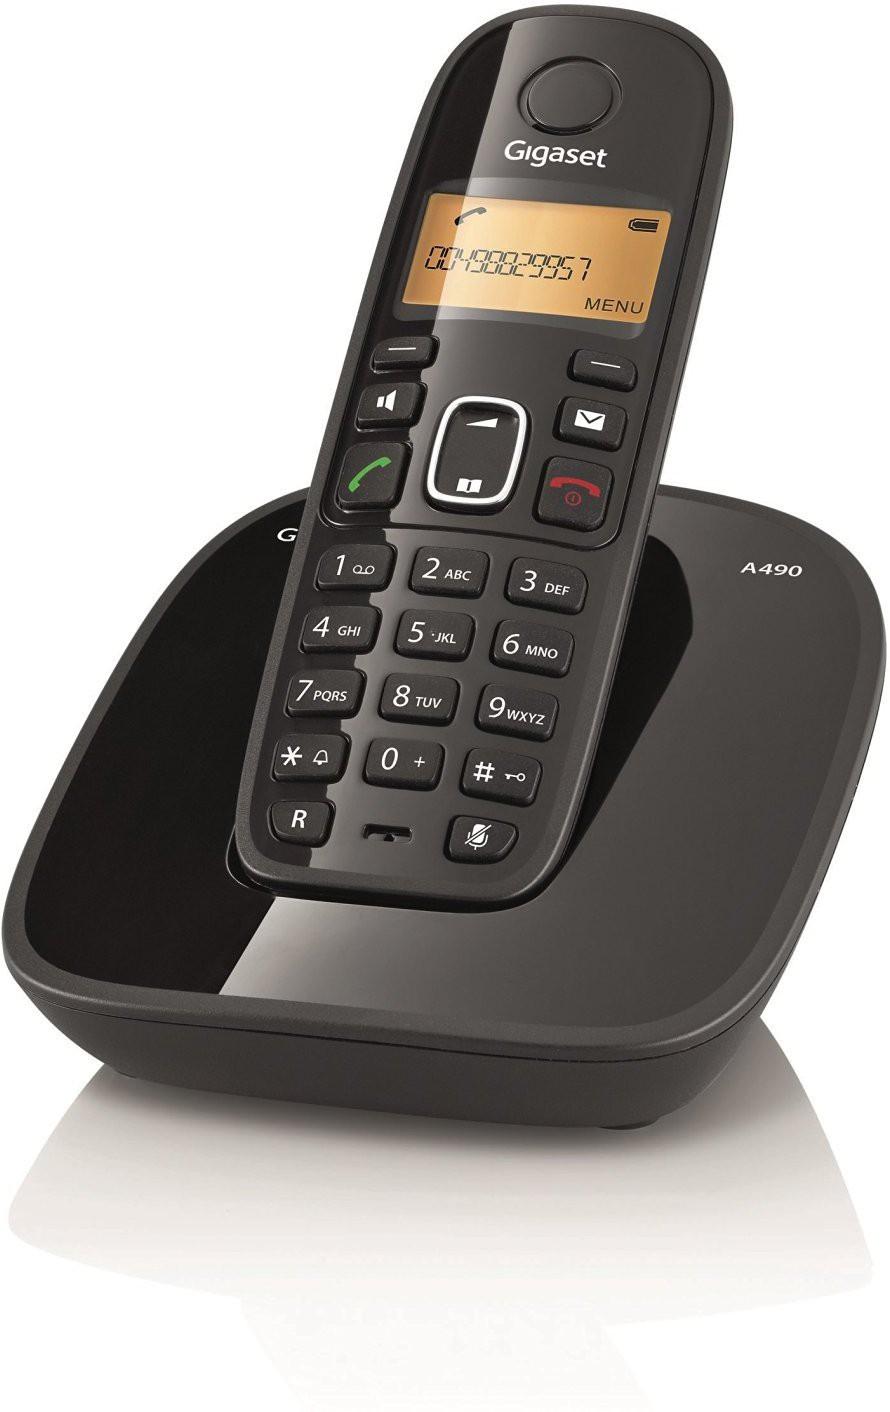 Deals - Thane - Landline Phones <br> Panasonic & more<br> Category - home_kitchen<br> Business - Flipkart.com